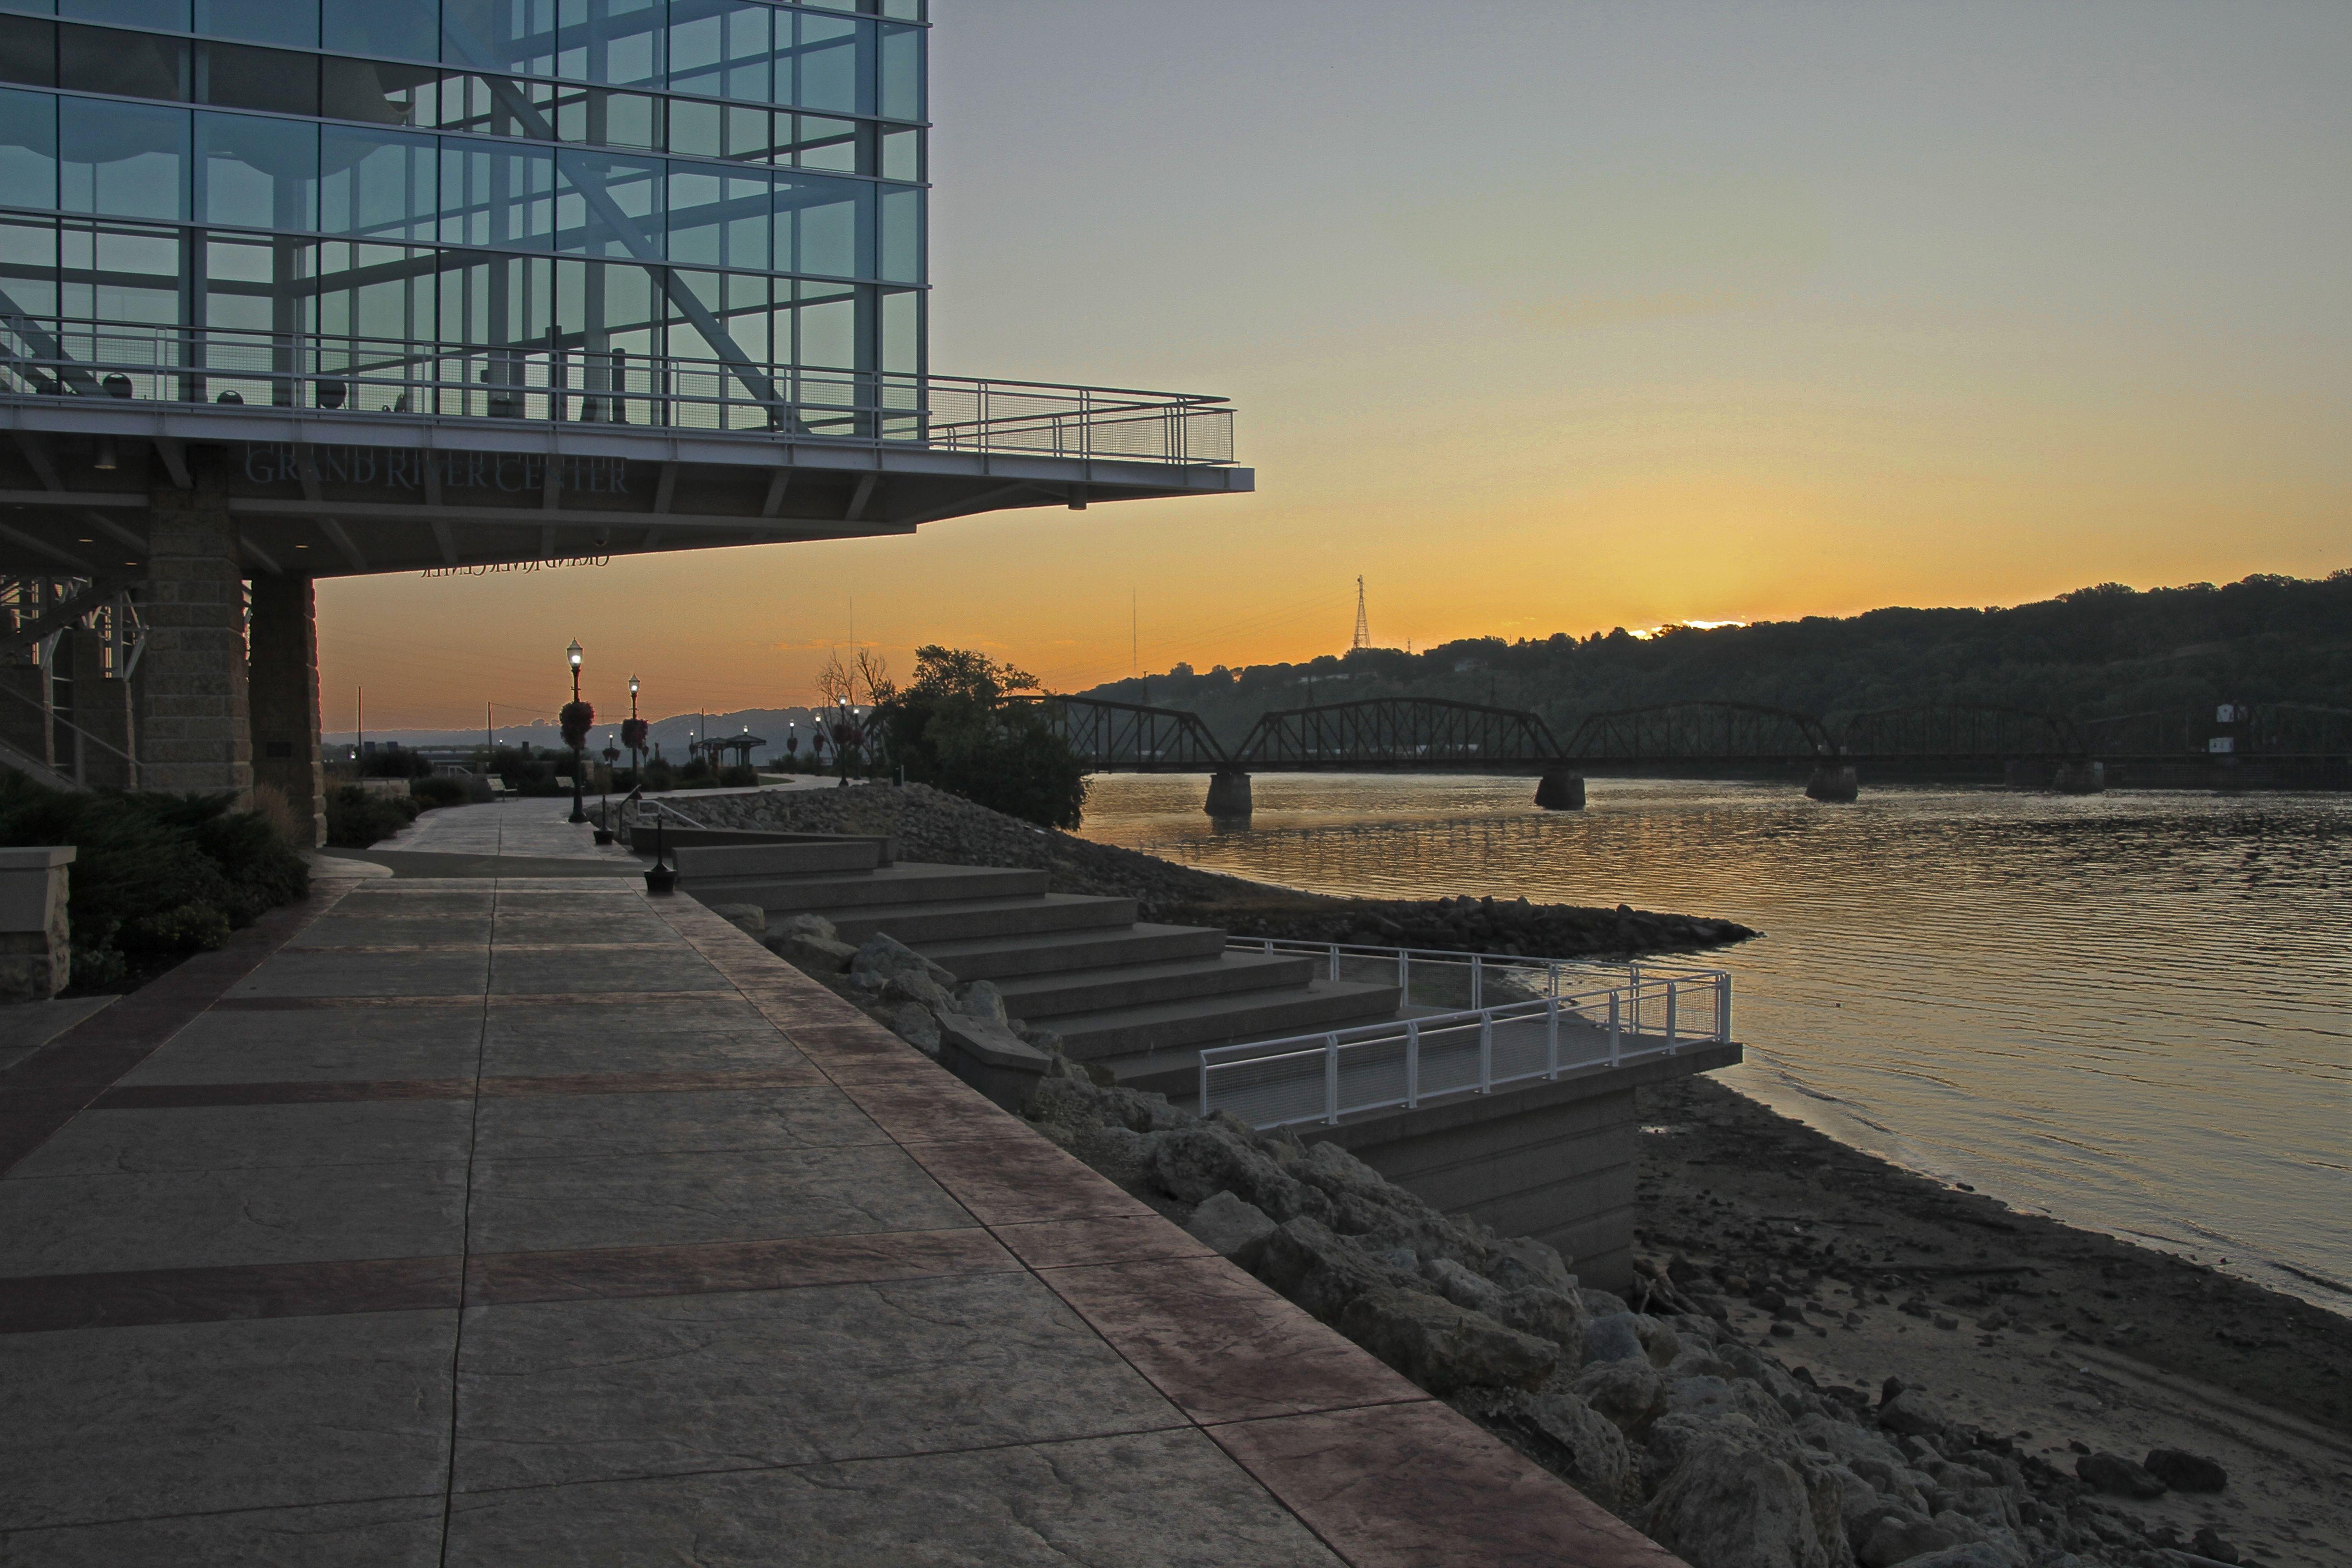 Sunrise over the Mississippi on the river walk.